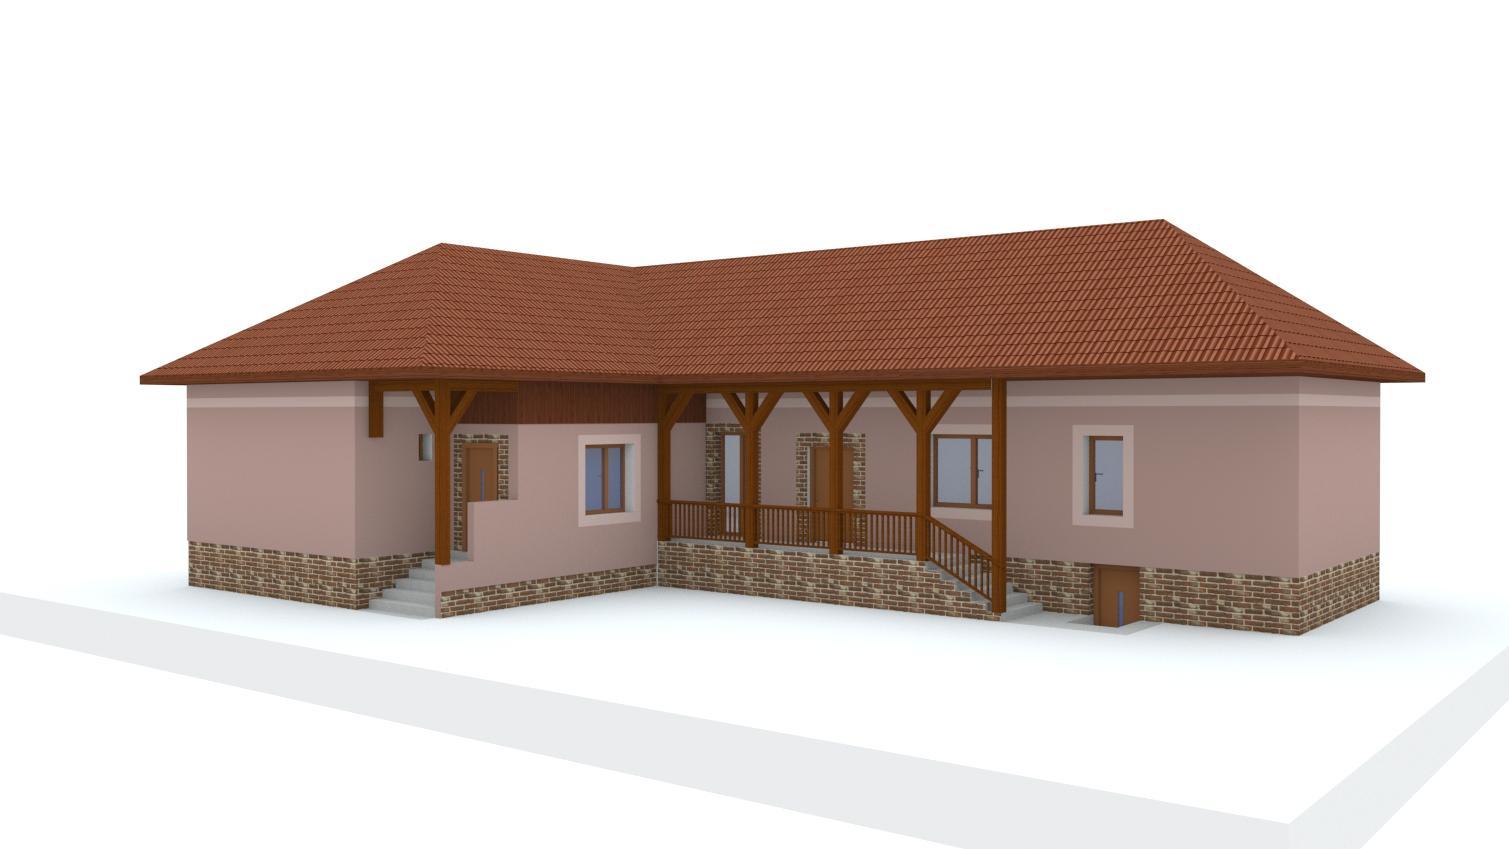 Návrh fasády rodinného domu - Obrázok č. 19